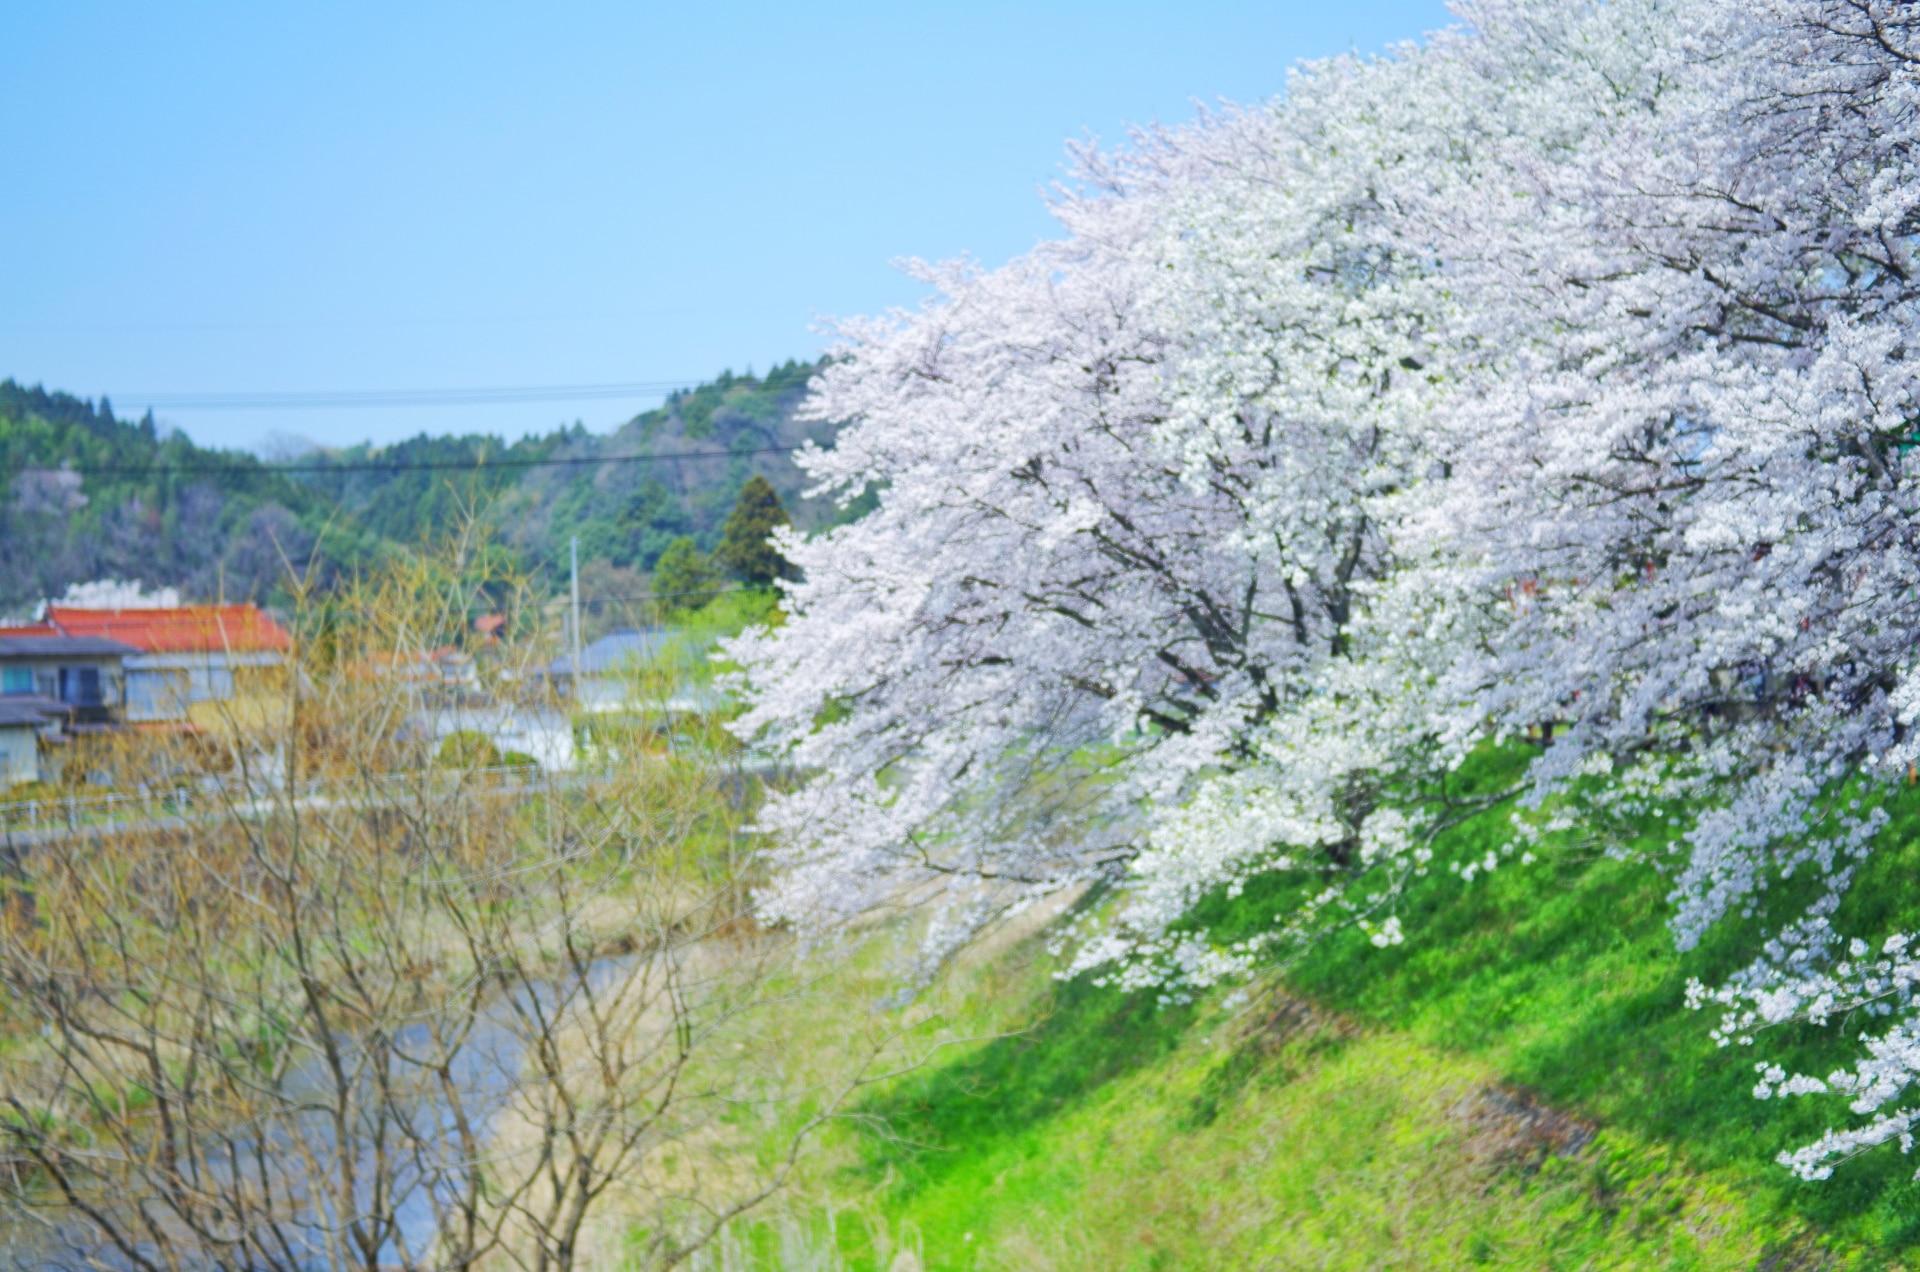 雲南市の桜の名所、斐伊川堤防桜並木